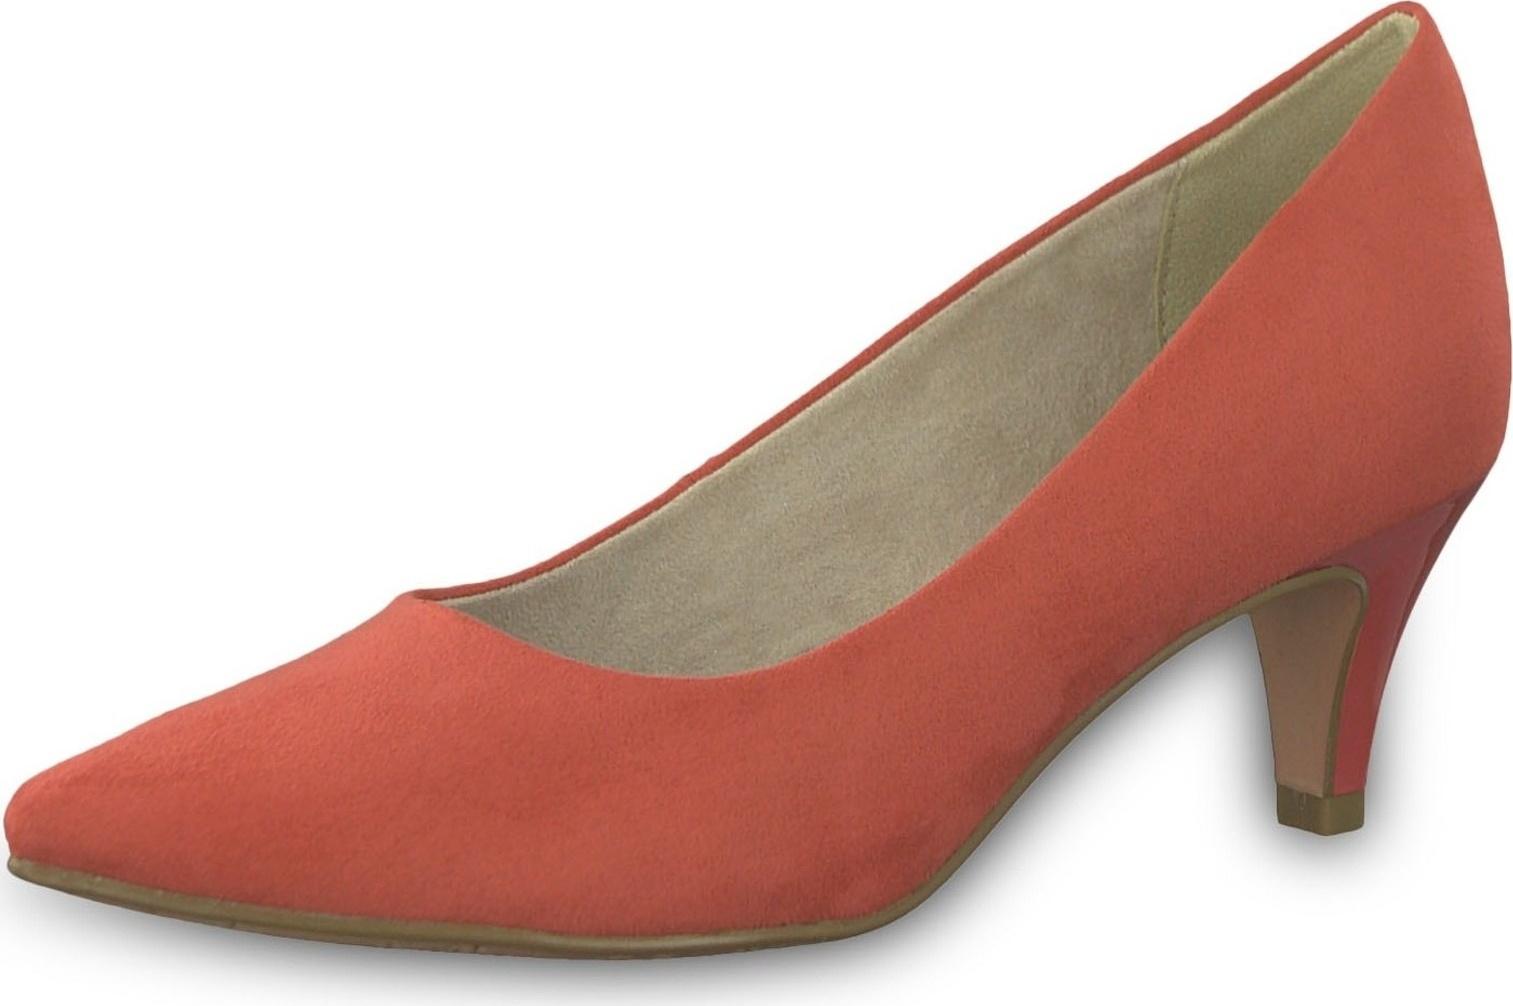 Dámská bota TAMARIS 1-1-22415-22 CHILI 533 – E-shop Tamaris cb4707f1fe